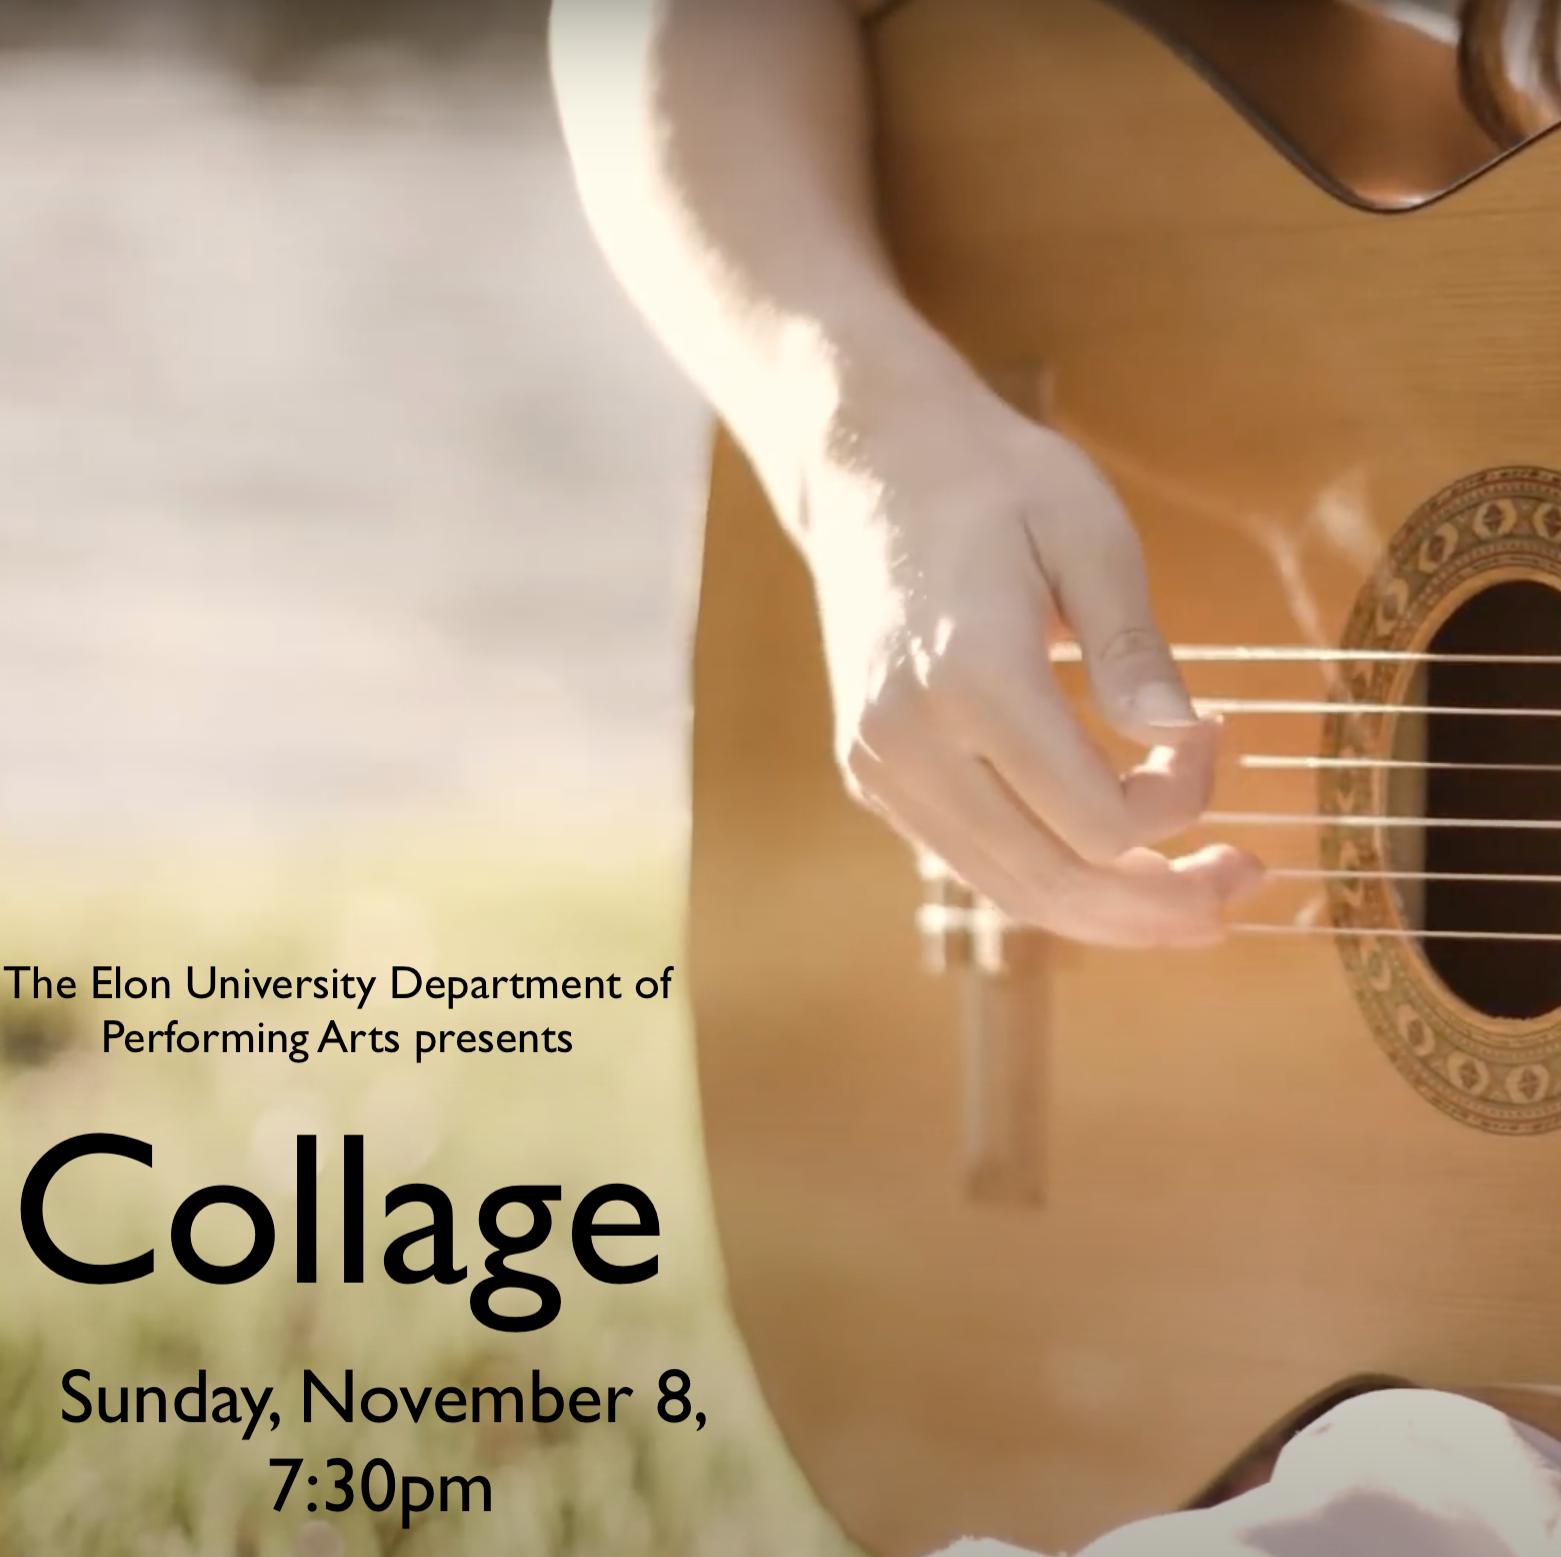 Collage, Sunday, Nov. 8, 7:30 pm